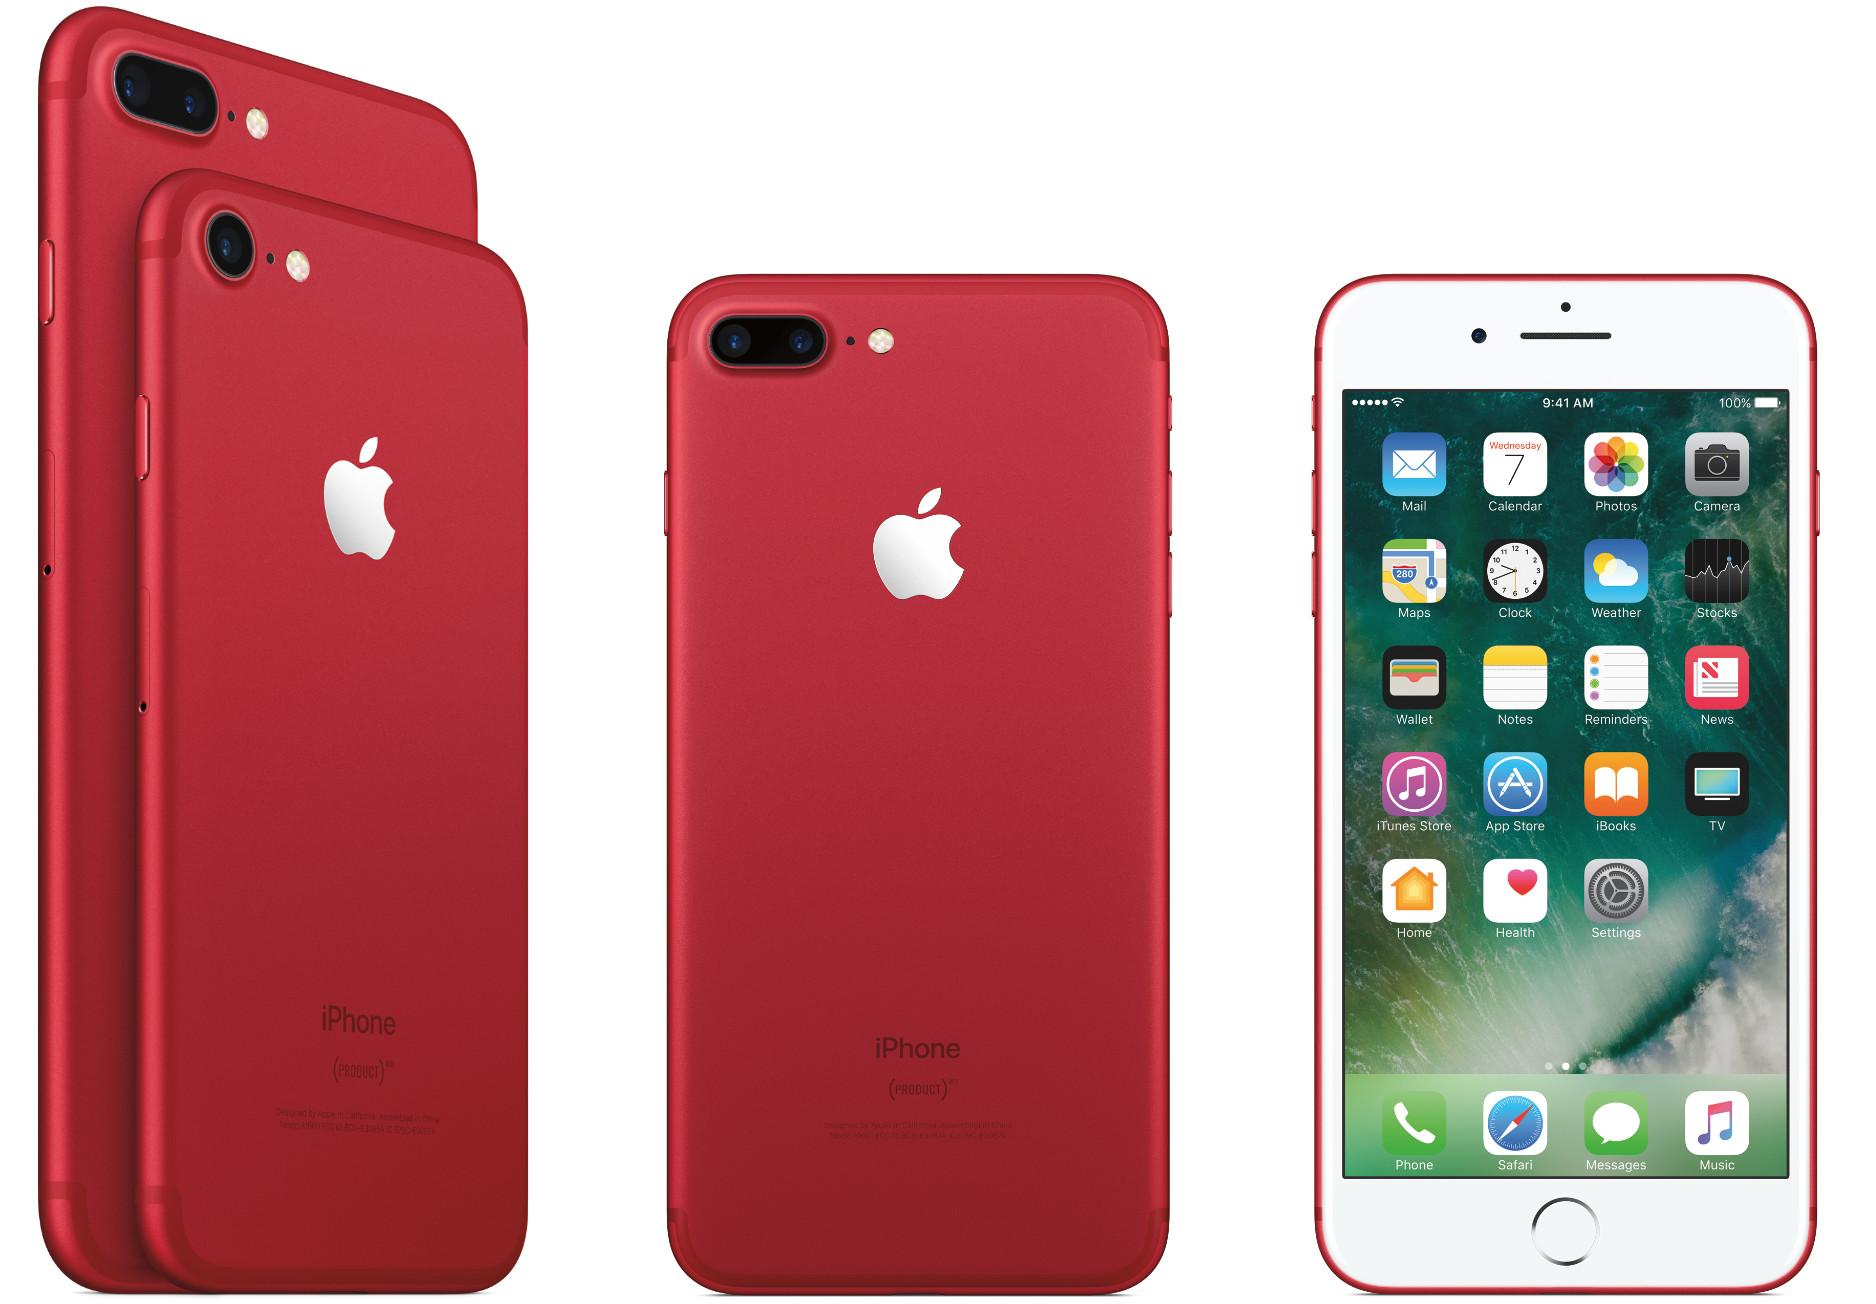 Iphone 7 bara snurrar